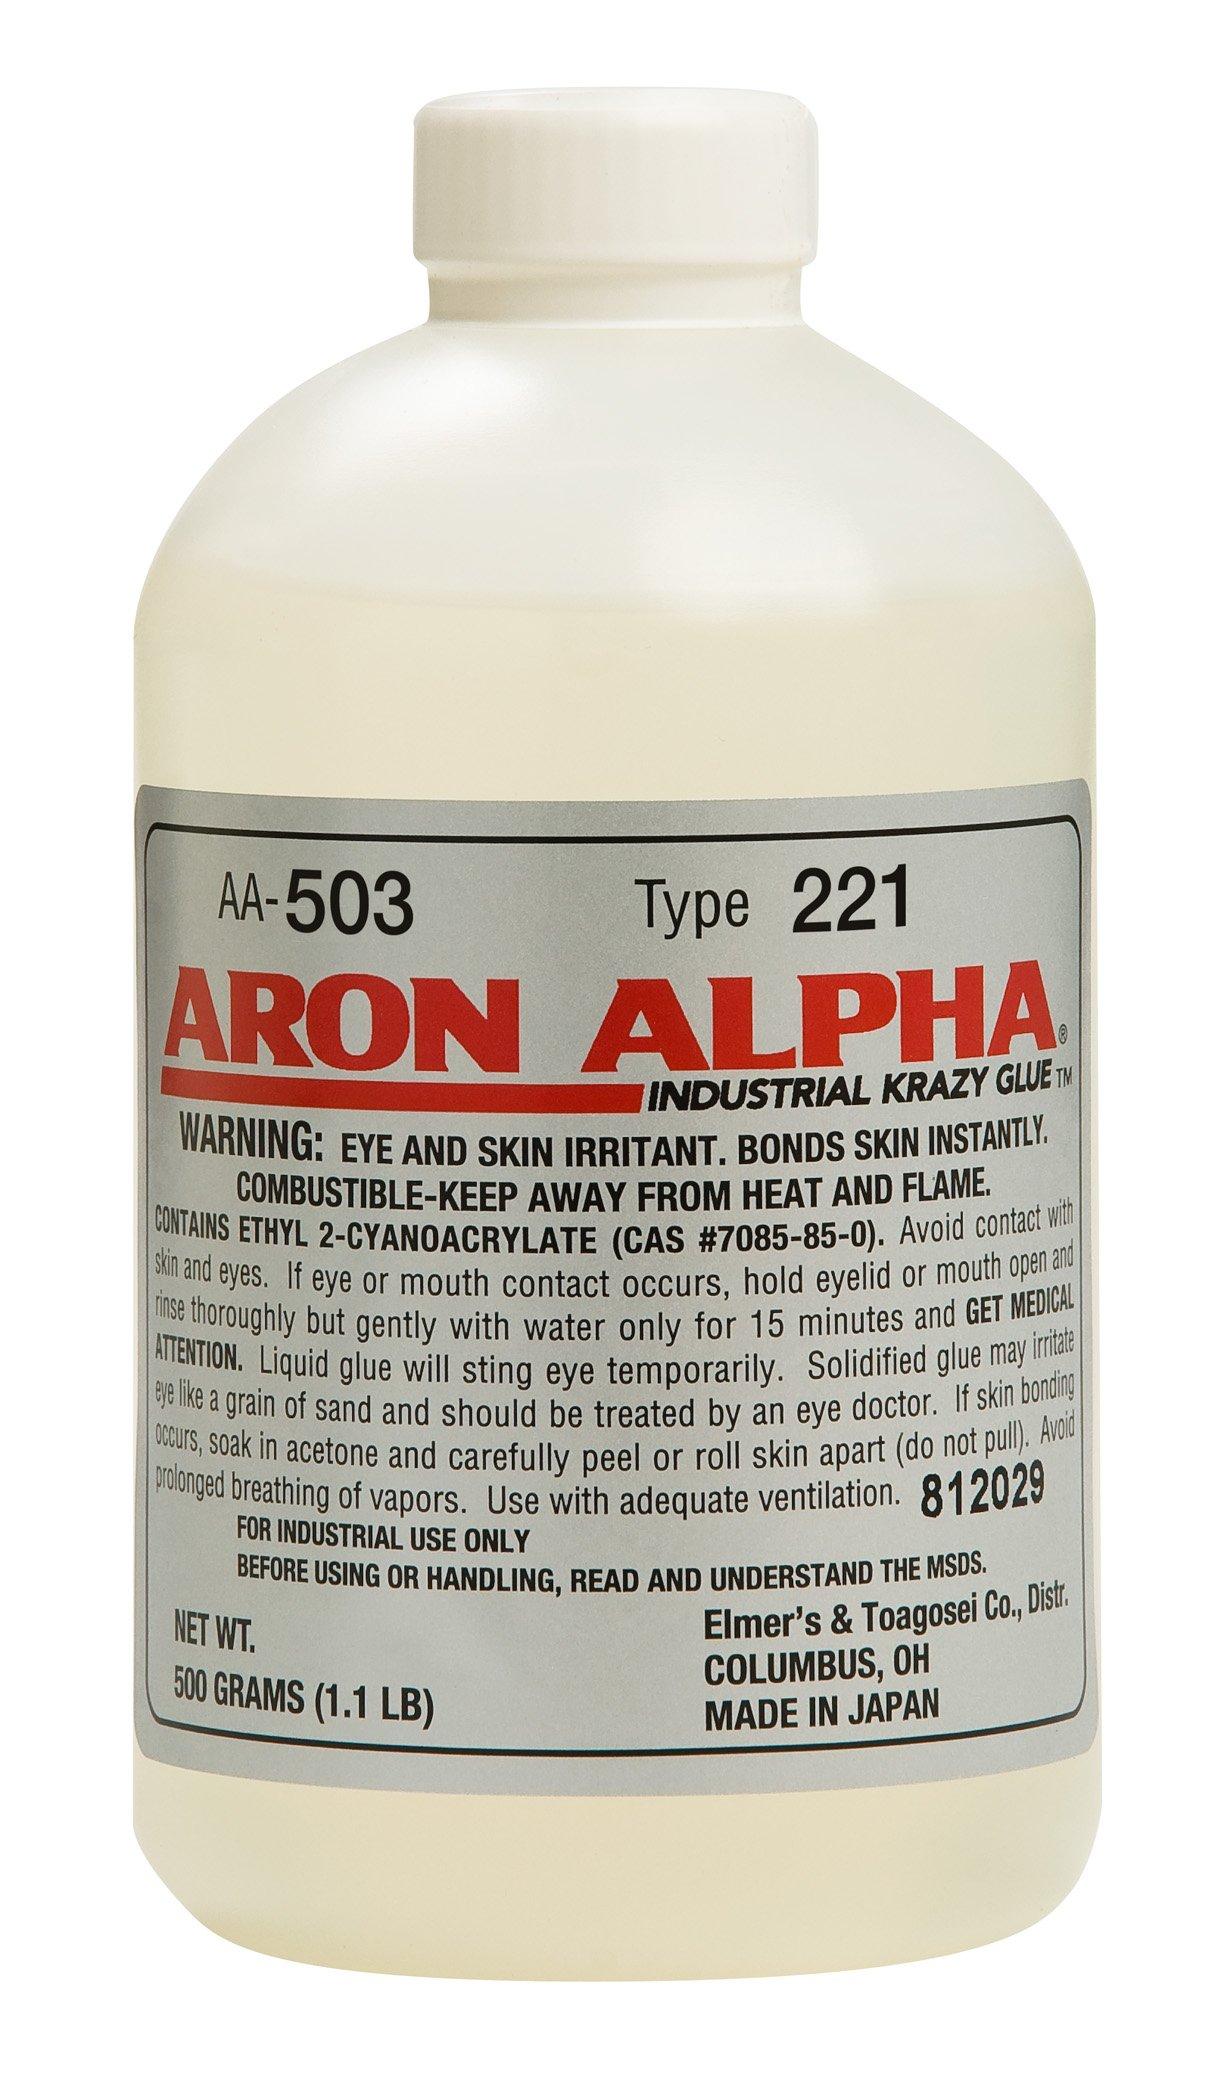 Aron Alpha Type 221 (2 cps viscosity) Fast Set Instant Adhesive 500 g (1.1 pound) Bottle